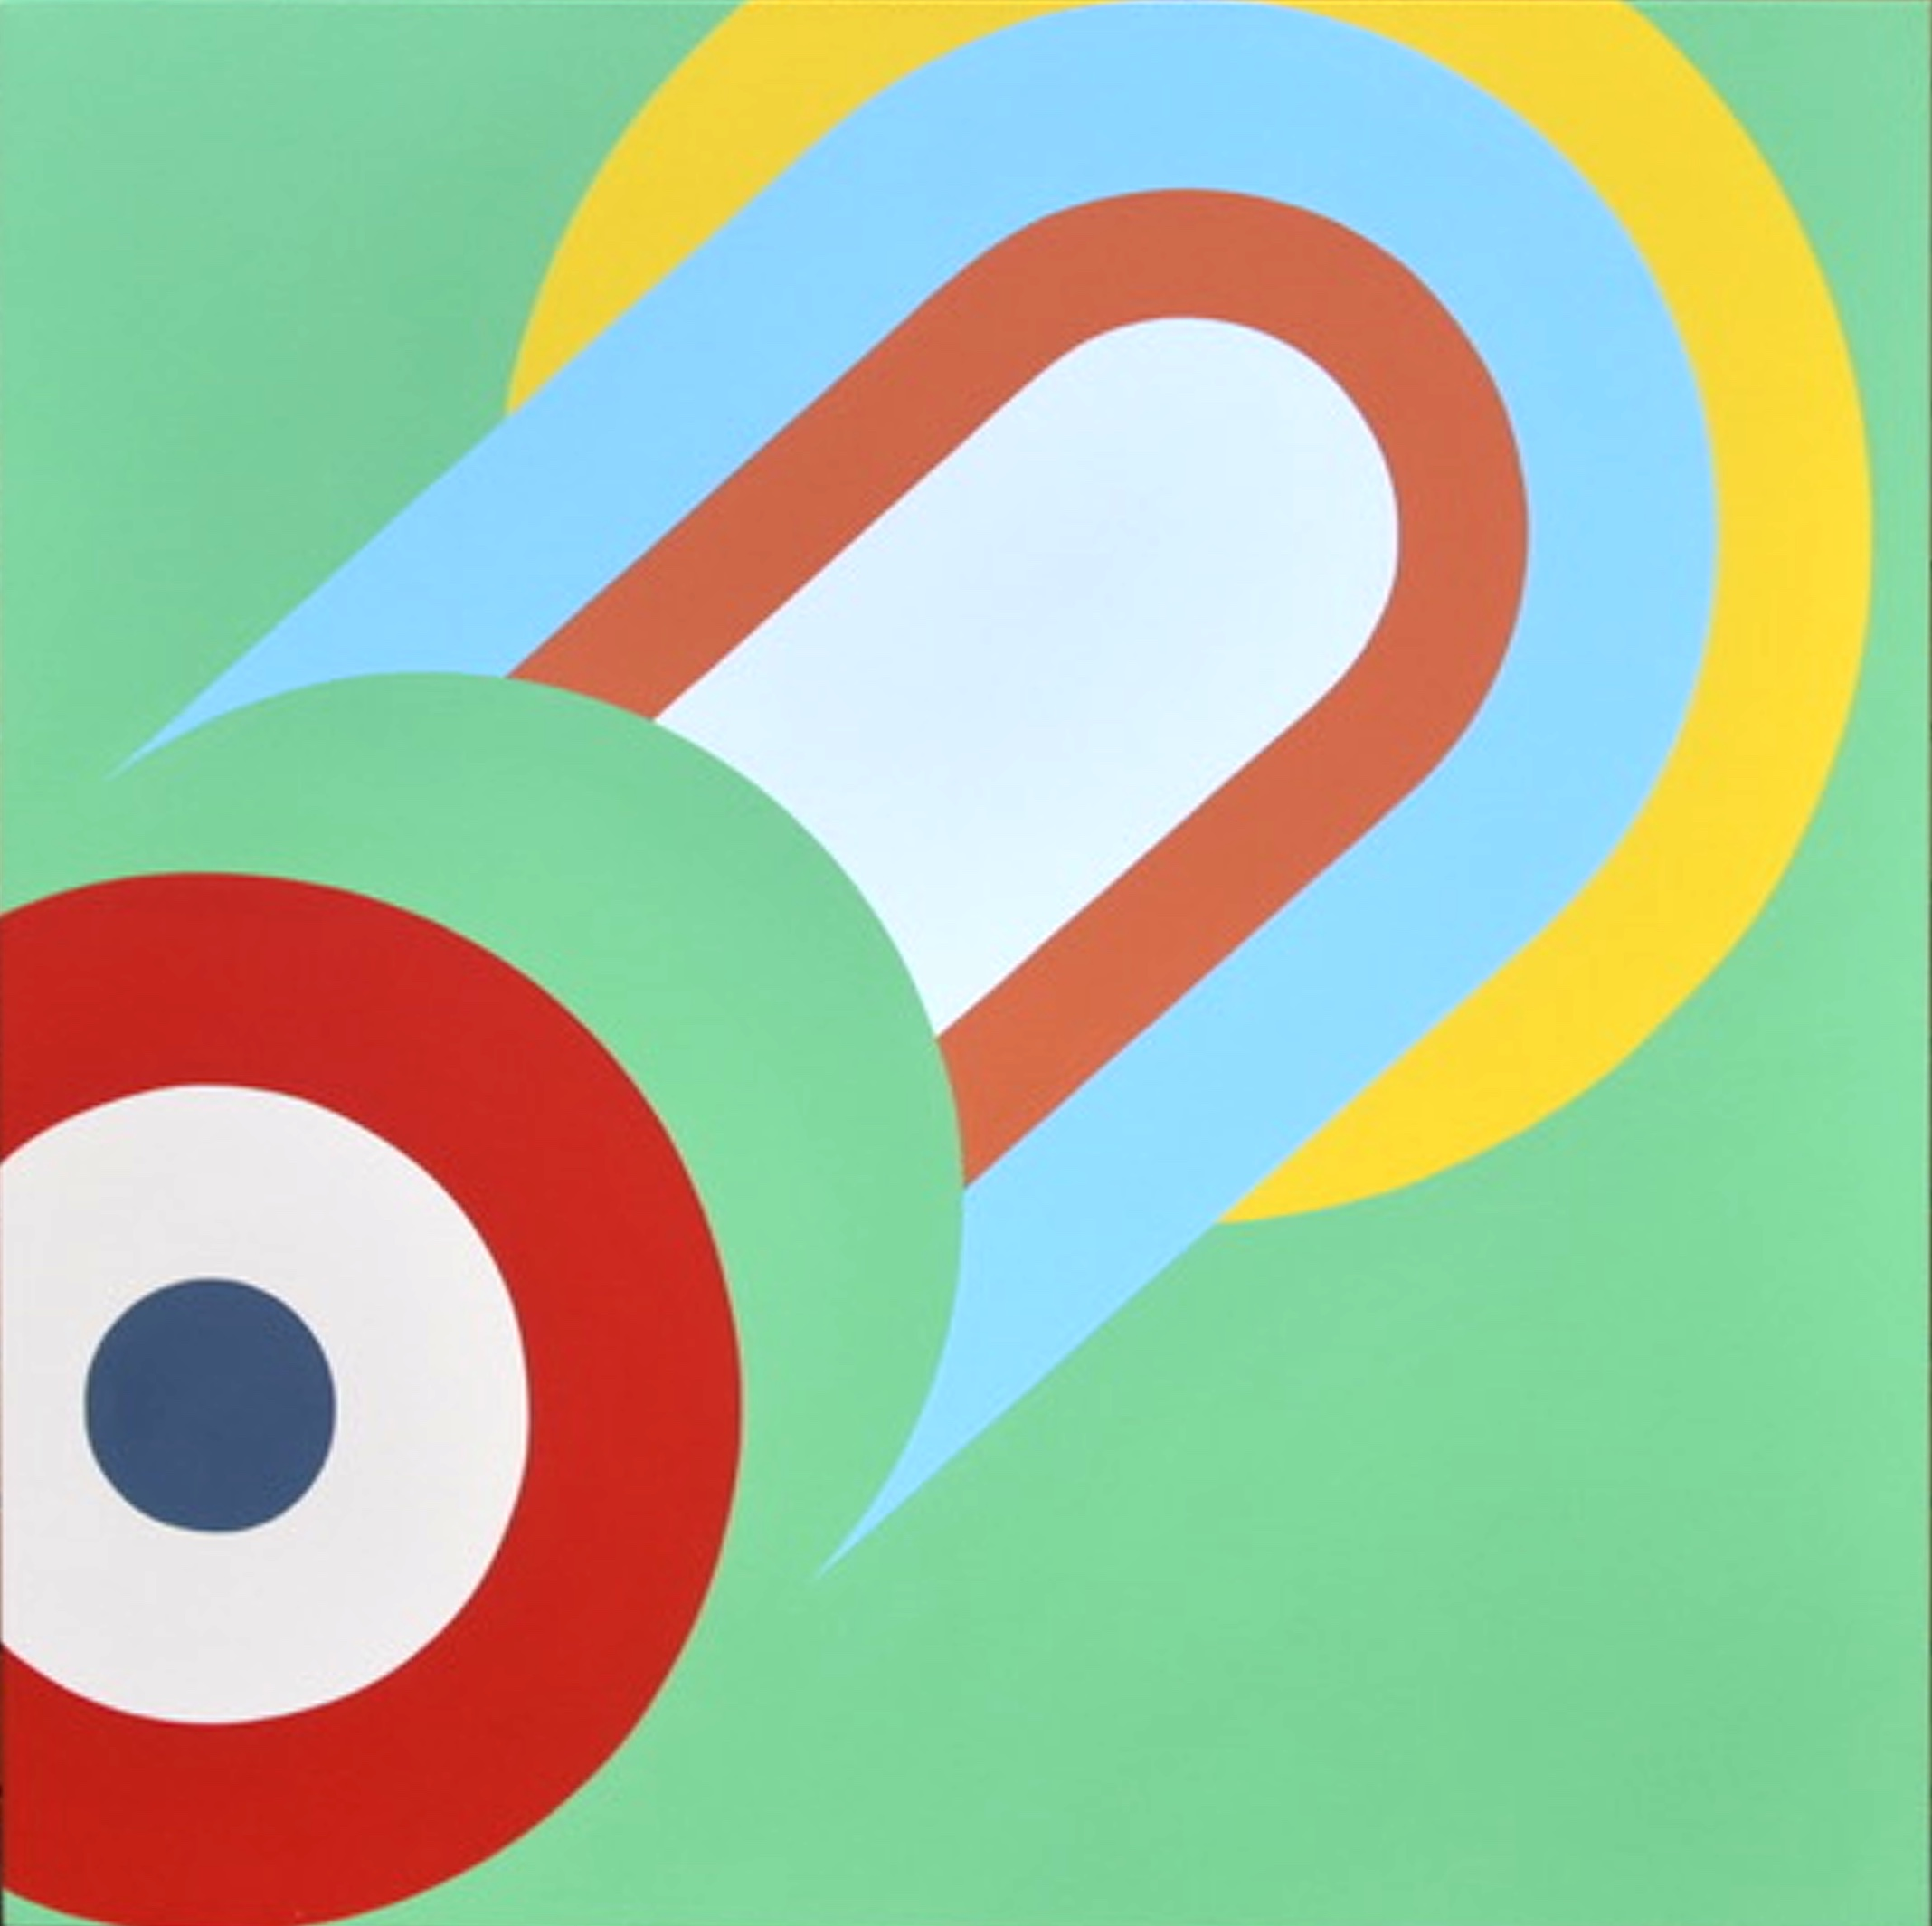 Untitled 8. 2018. Acrylic on canvas. 101.5 x 101.5 cm $2800